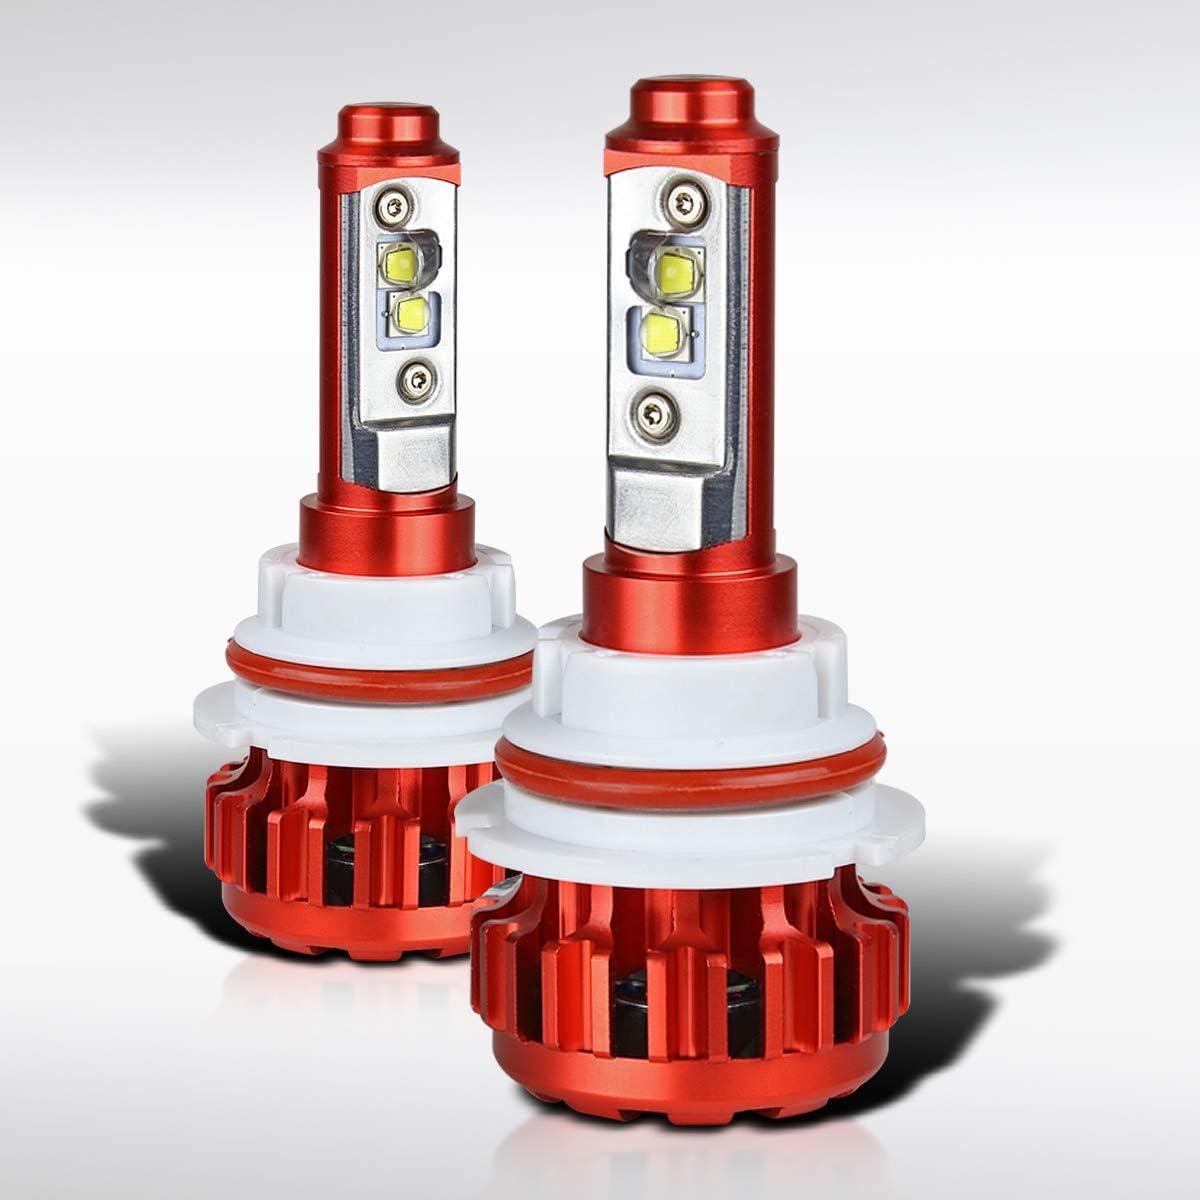 Cree LED Headlight Kit 9005 HB3 H10 9140 9145 1200W 6000K 180000LM Bulbs Pair